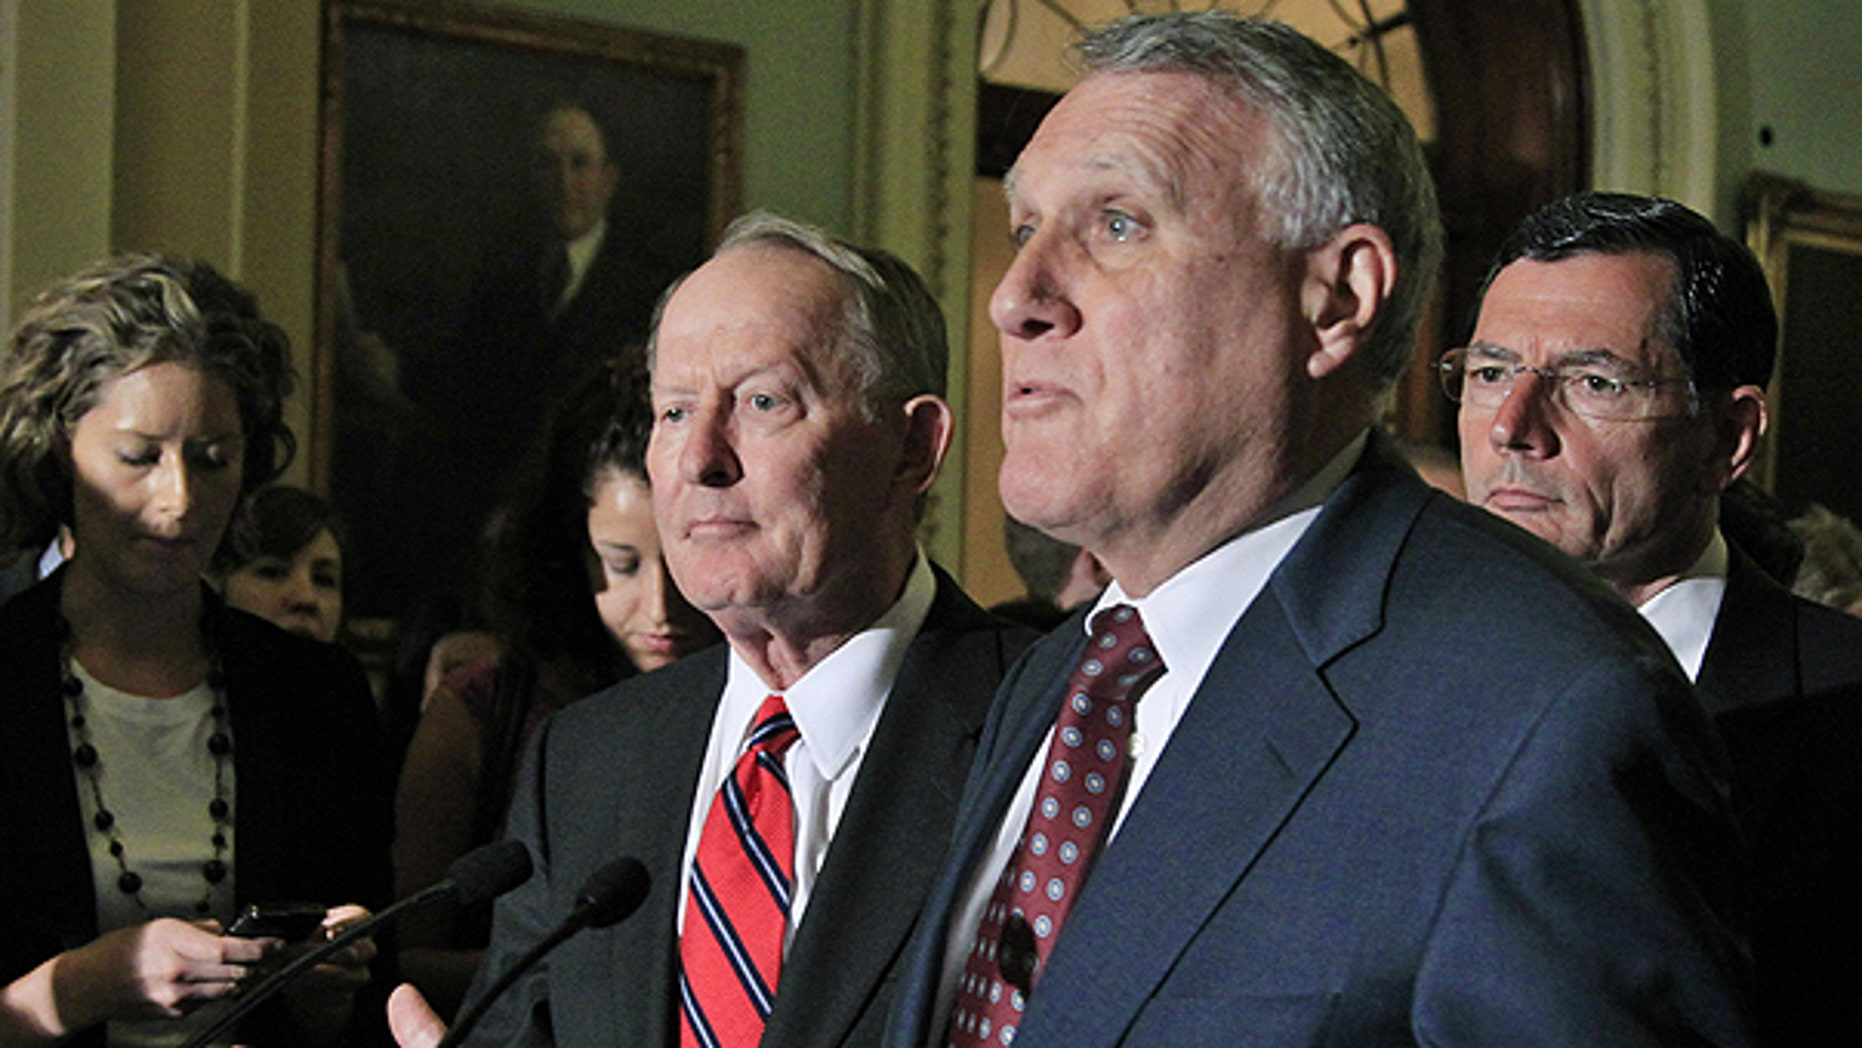 July 6: Senate Minority Whip Jon Kyl of Ariz., center, accompanied by Sen. Lamar Alexander, R-Tenn., left, and Sen. John Barrasso, R-Wyo., speaks on Capitol Hill in Washington.